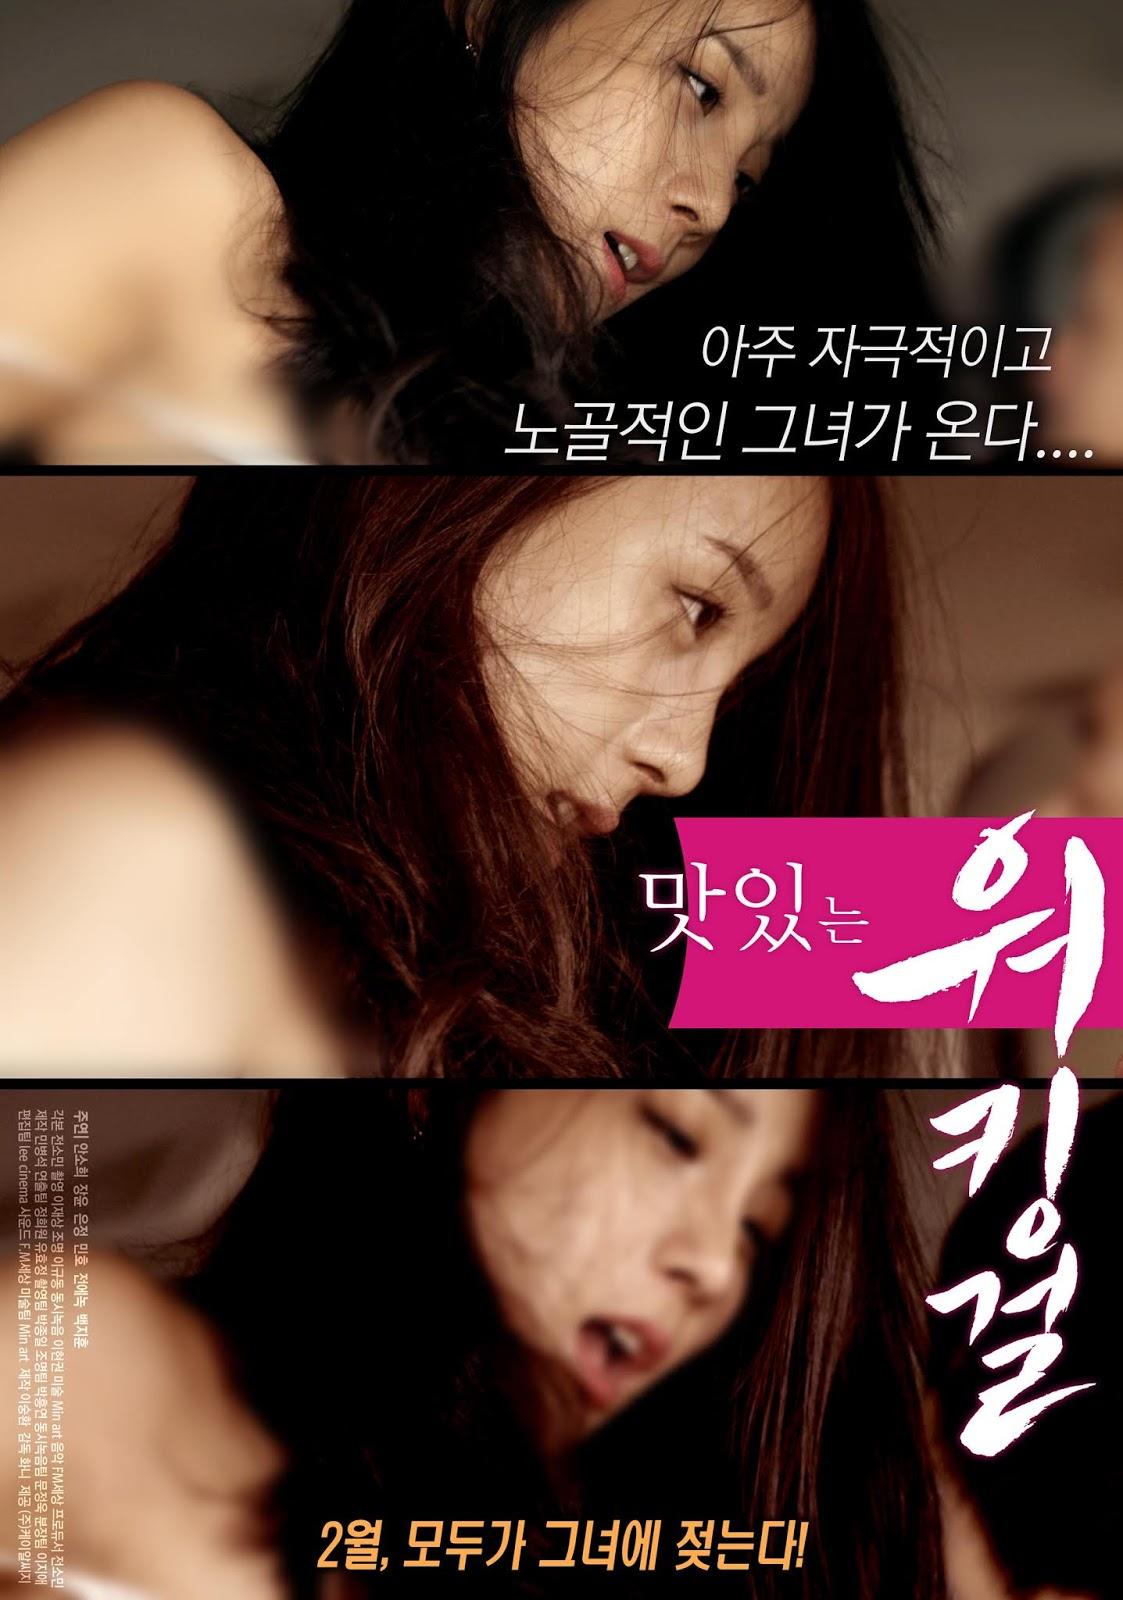 Delicious Walking Girl Full Korea 18+ Adult Movie Online Free